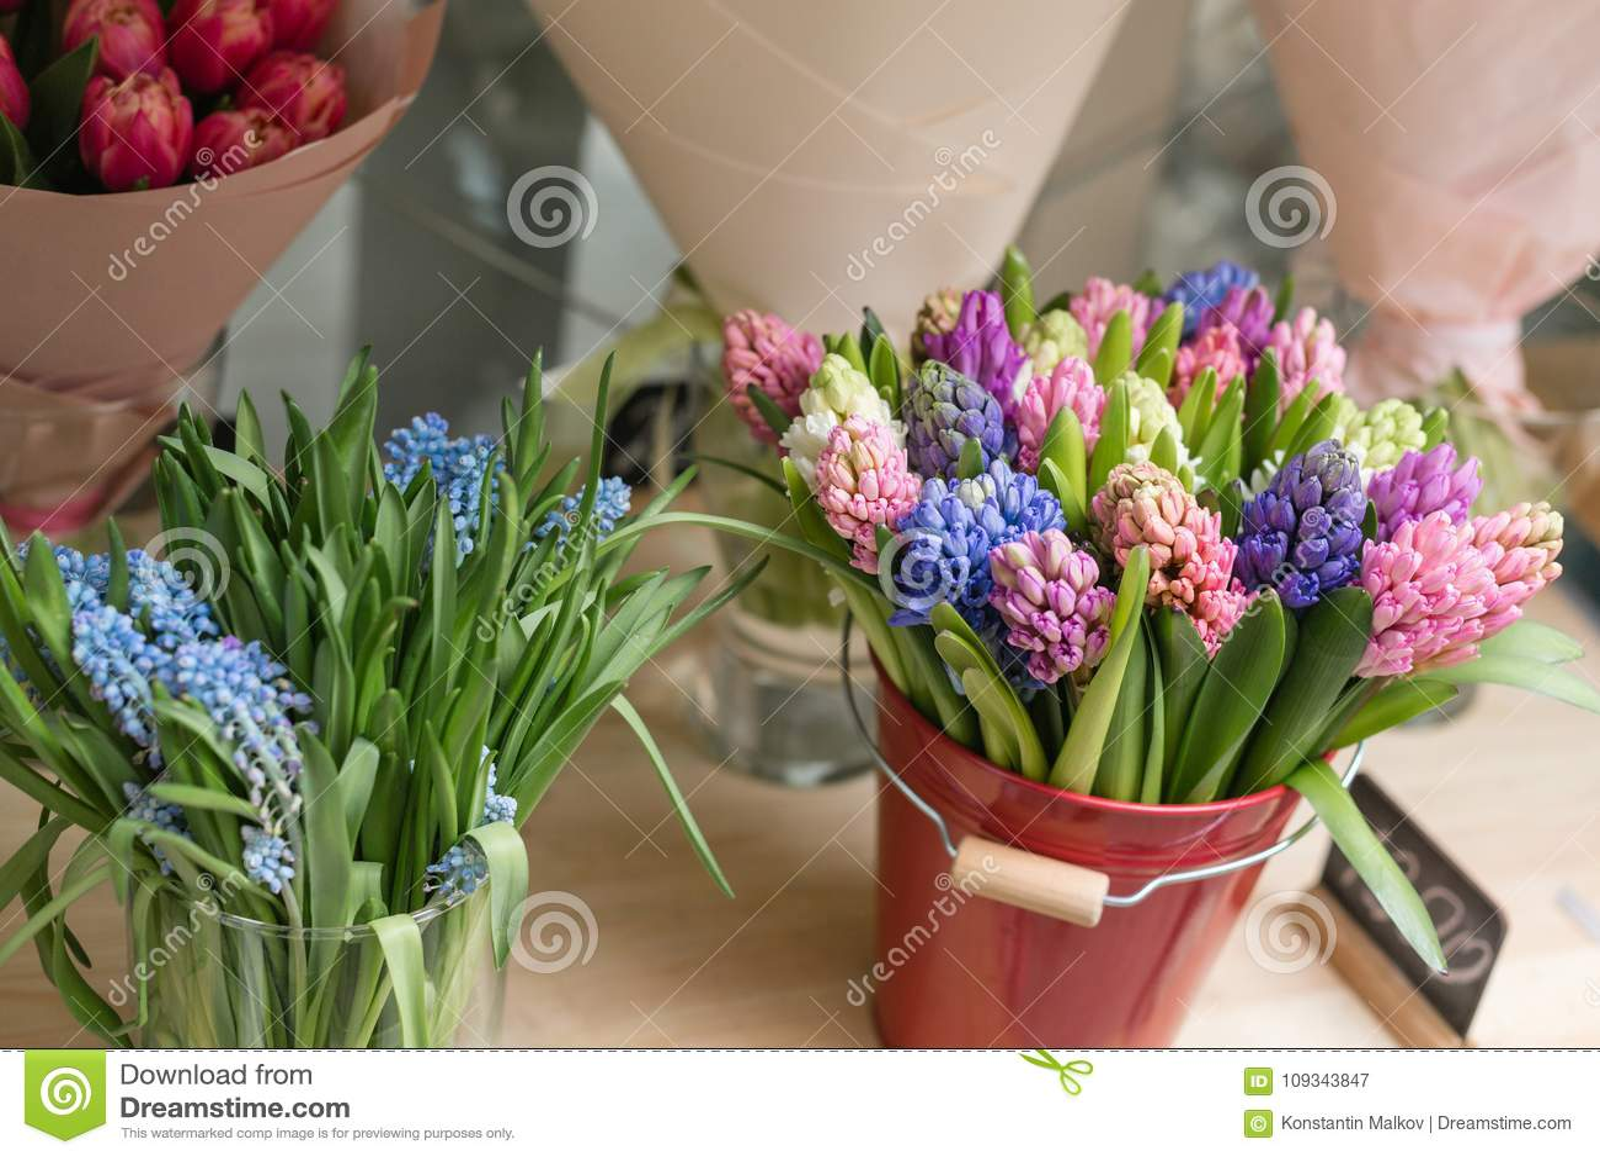 Flower shop concept different varieties fresh spring flowers in flower shop concept different varieties fresh spring flowers in refrigerator for flowers bouquets on shelf florist business mightylinksfo